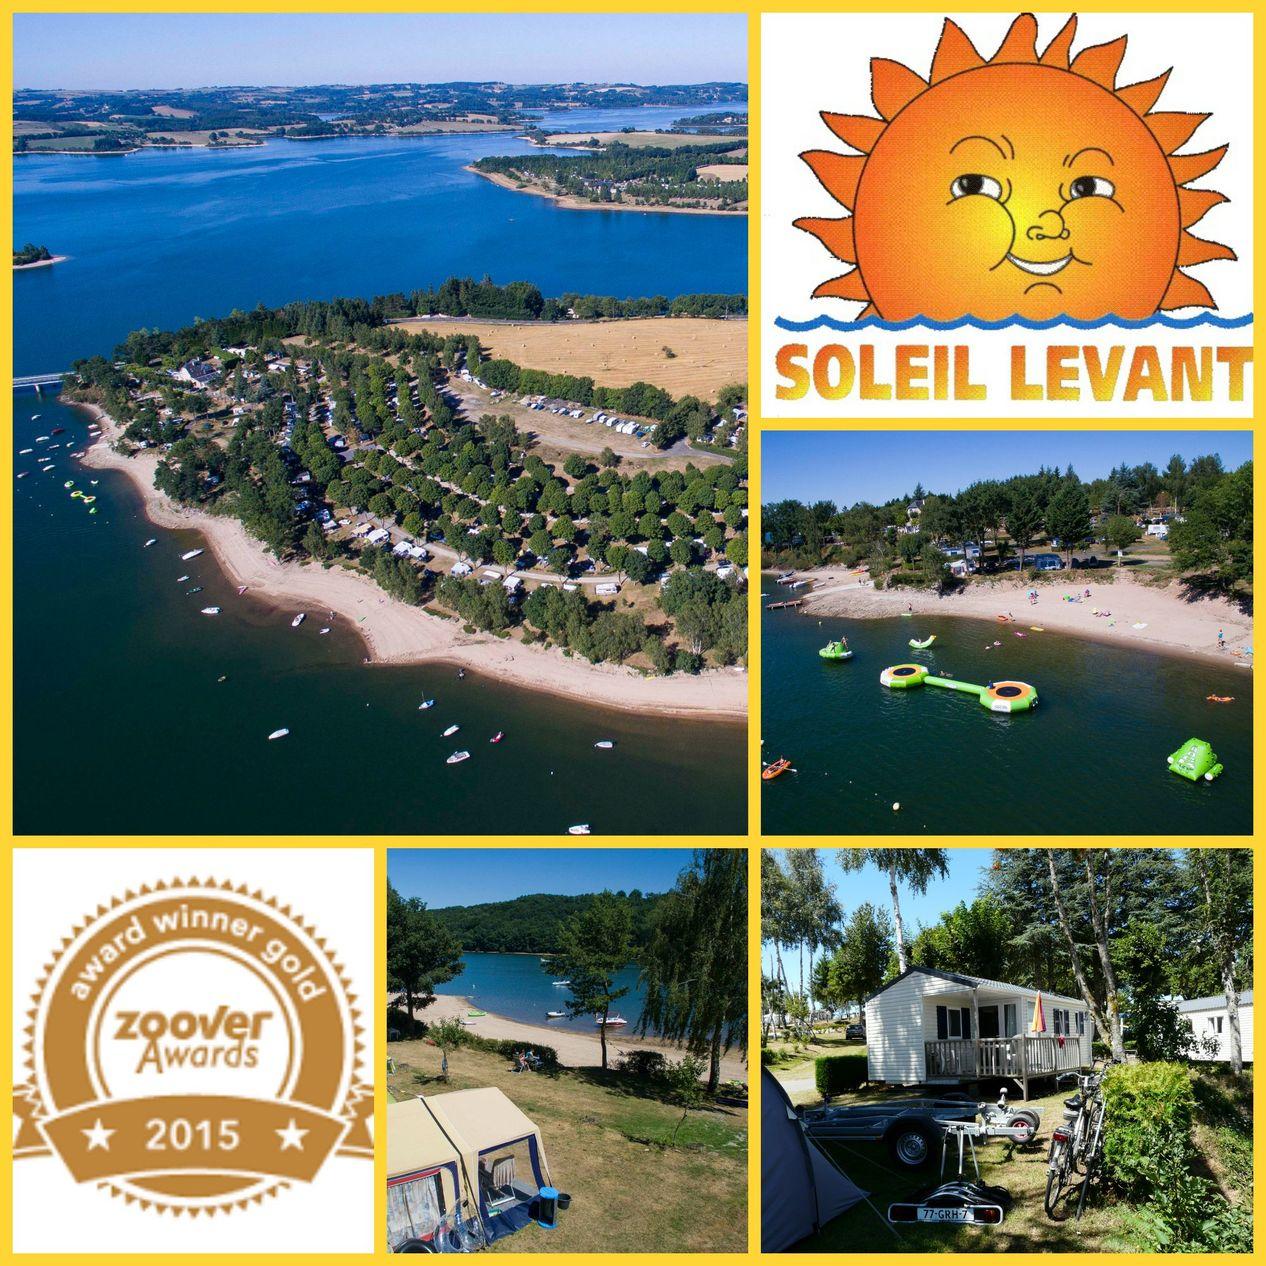 Frankrijk-CanetdeSalars-Camping%20Soleil%20Levant-ExtraLarge Wintersport Frankrijk|Pagina 2 van 55